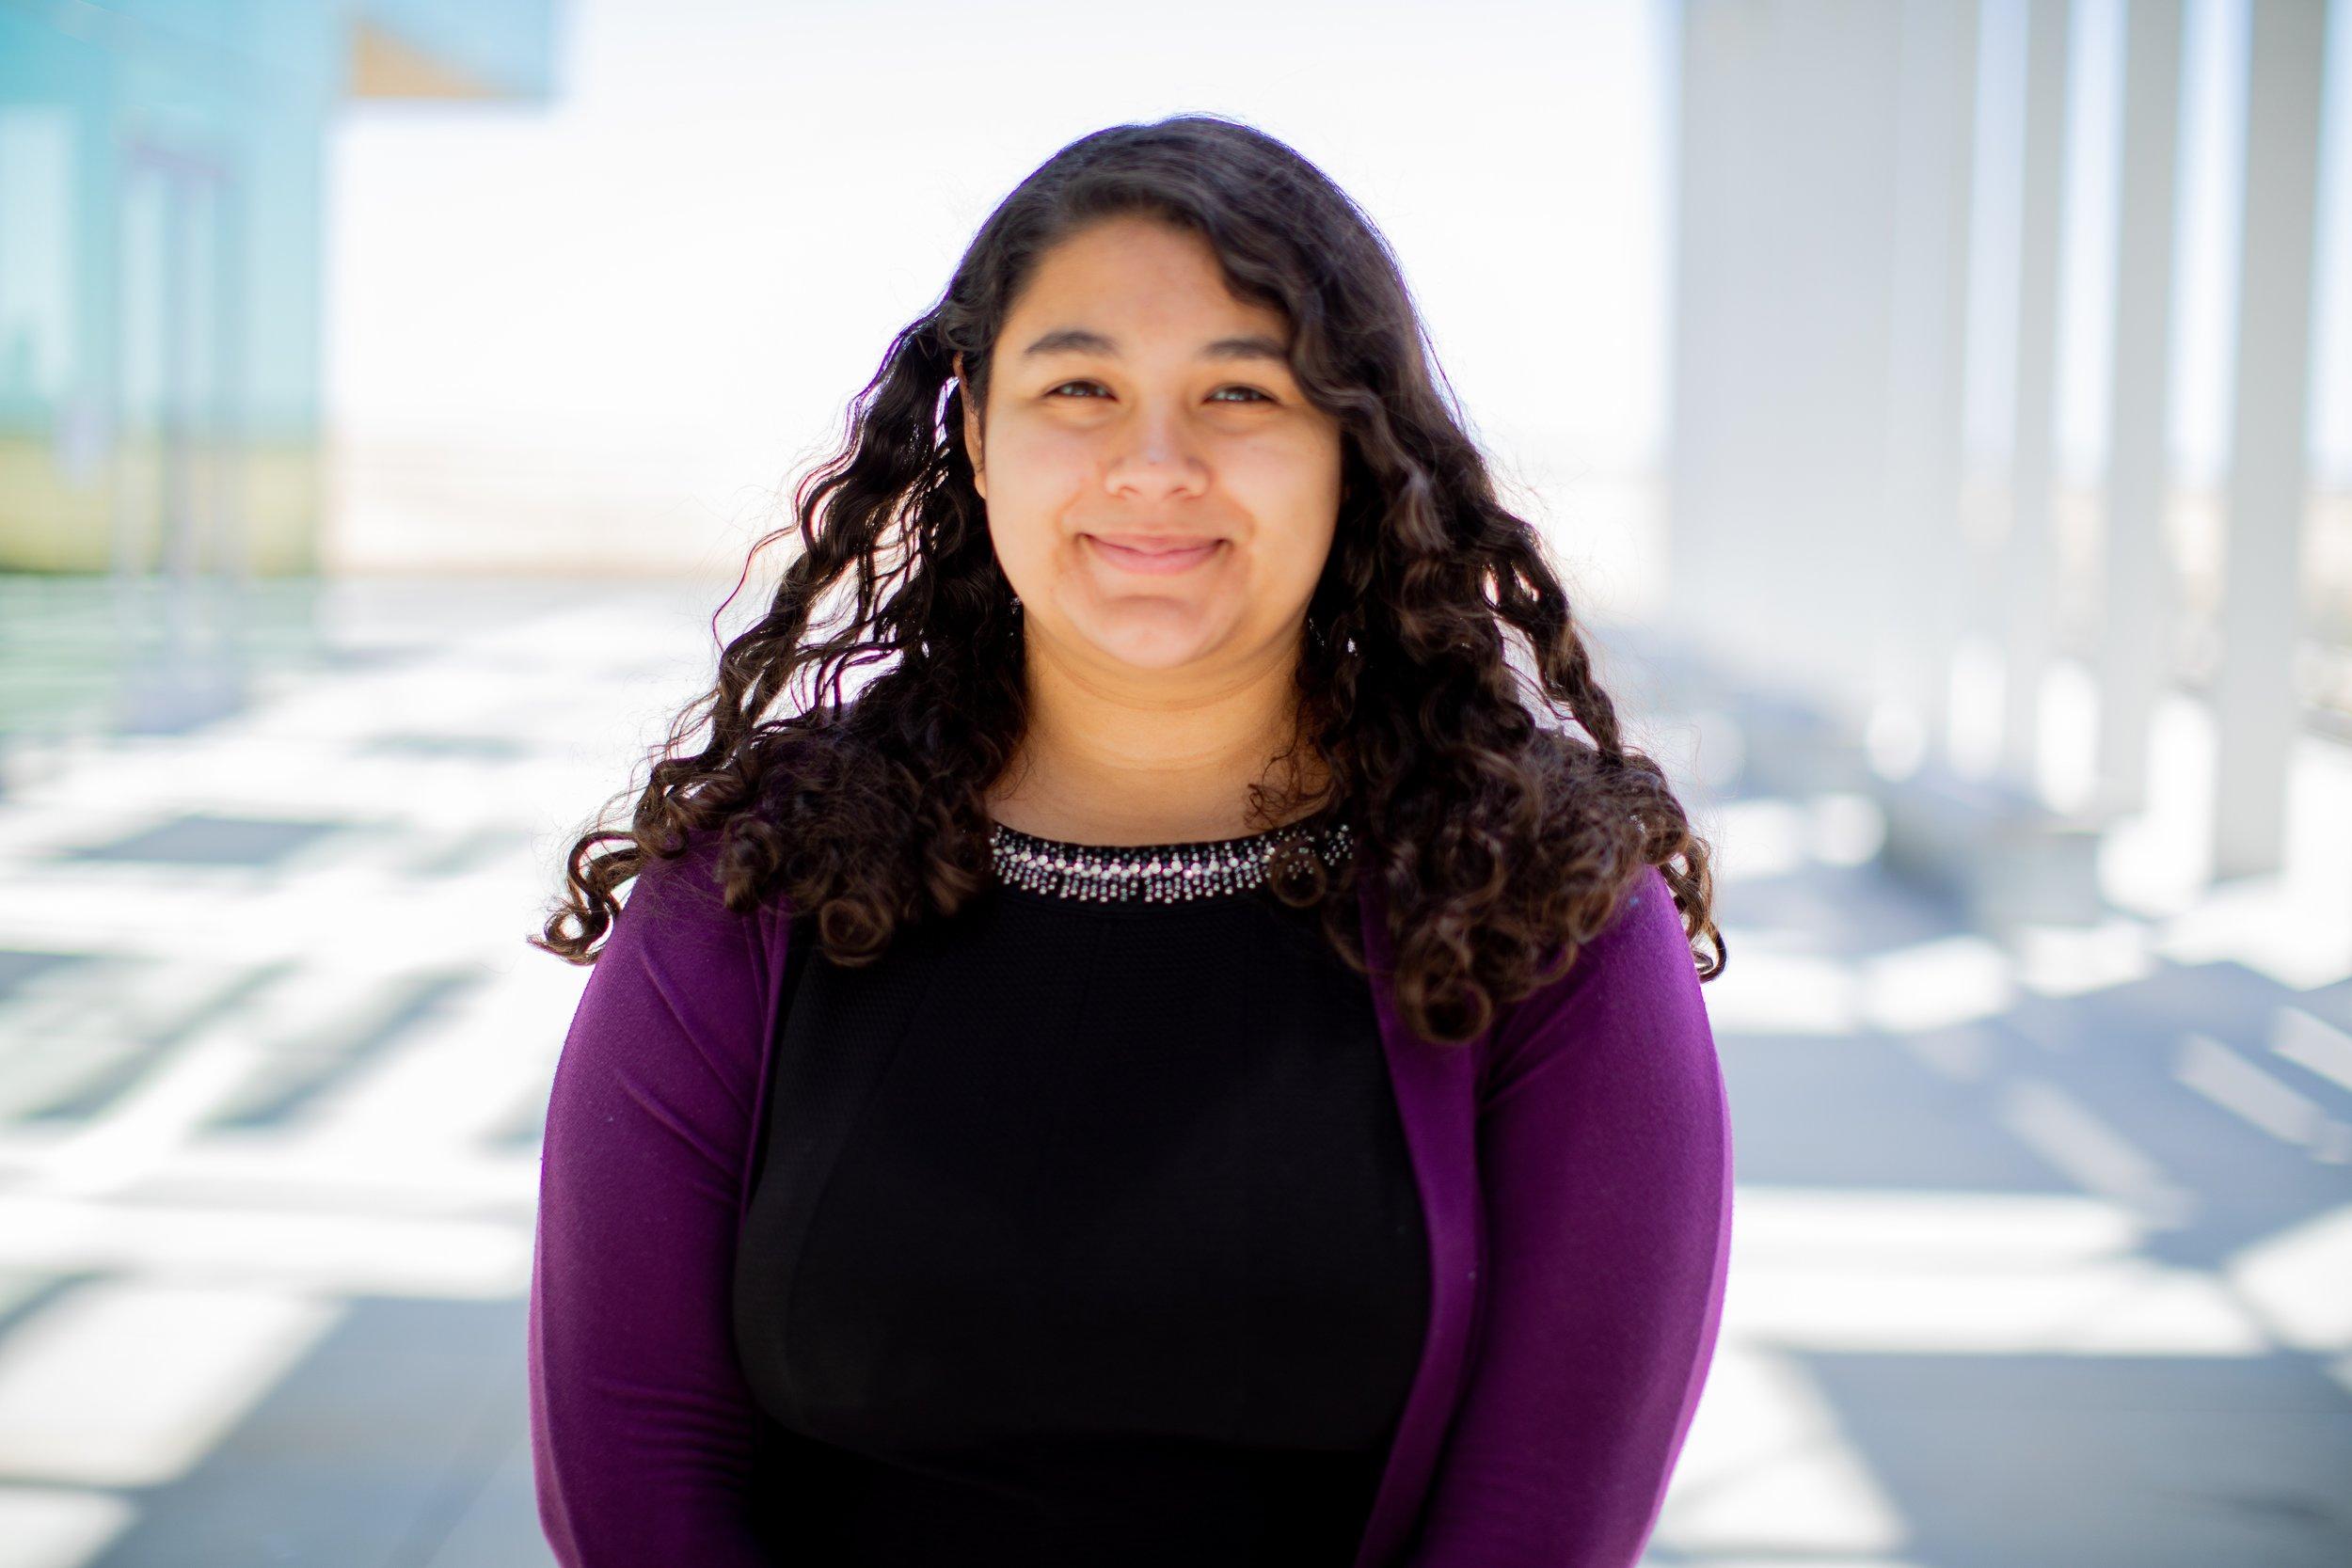 Yaneth Hernandez, Undergraduate Student